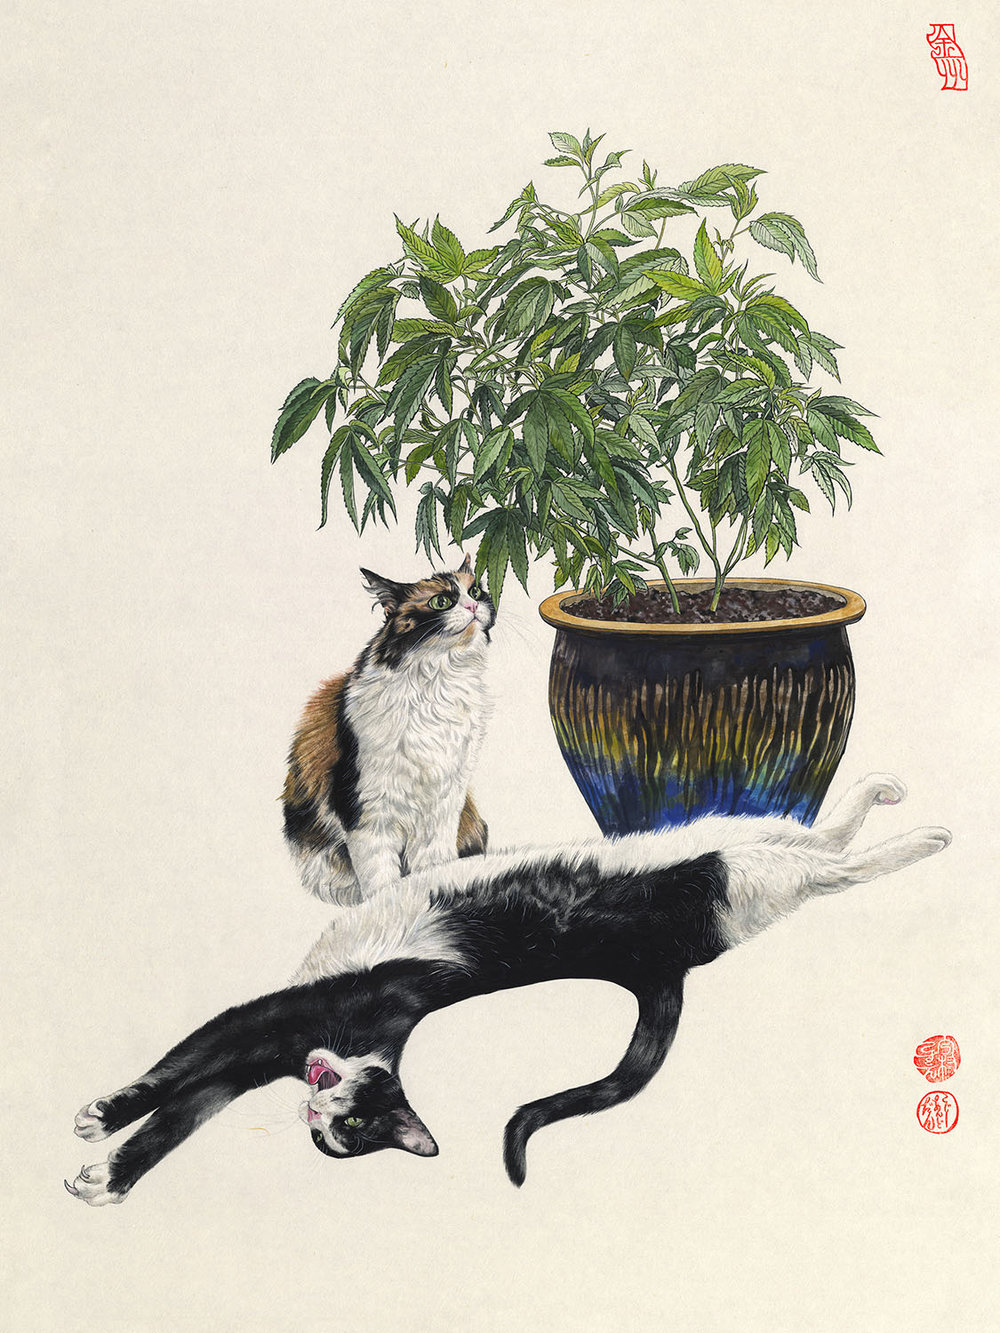 kitties_and_kush_PRINTsample_sm.jpg